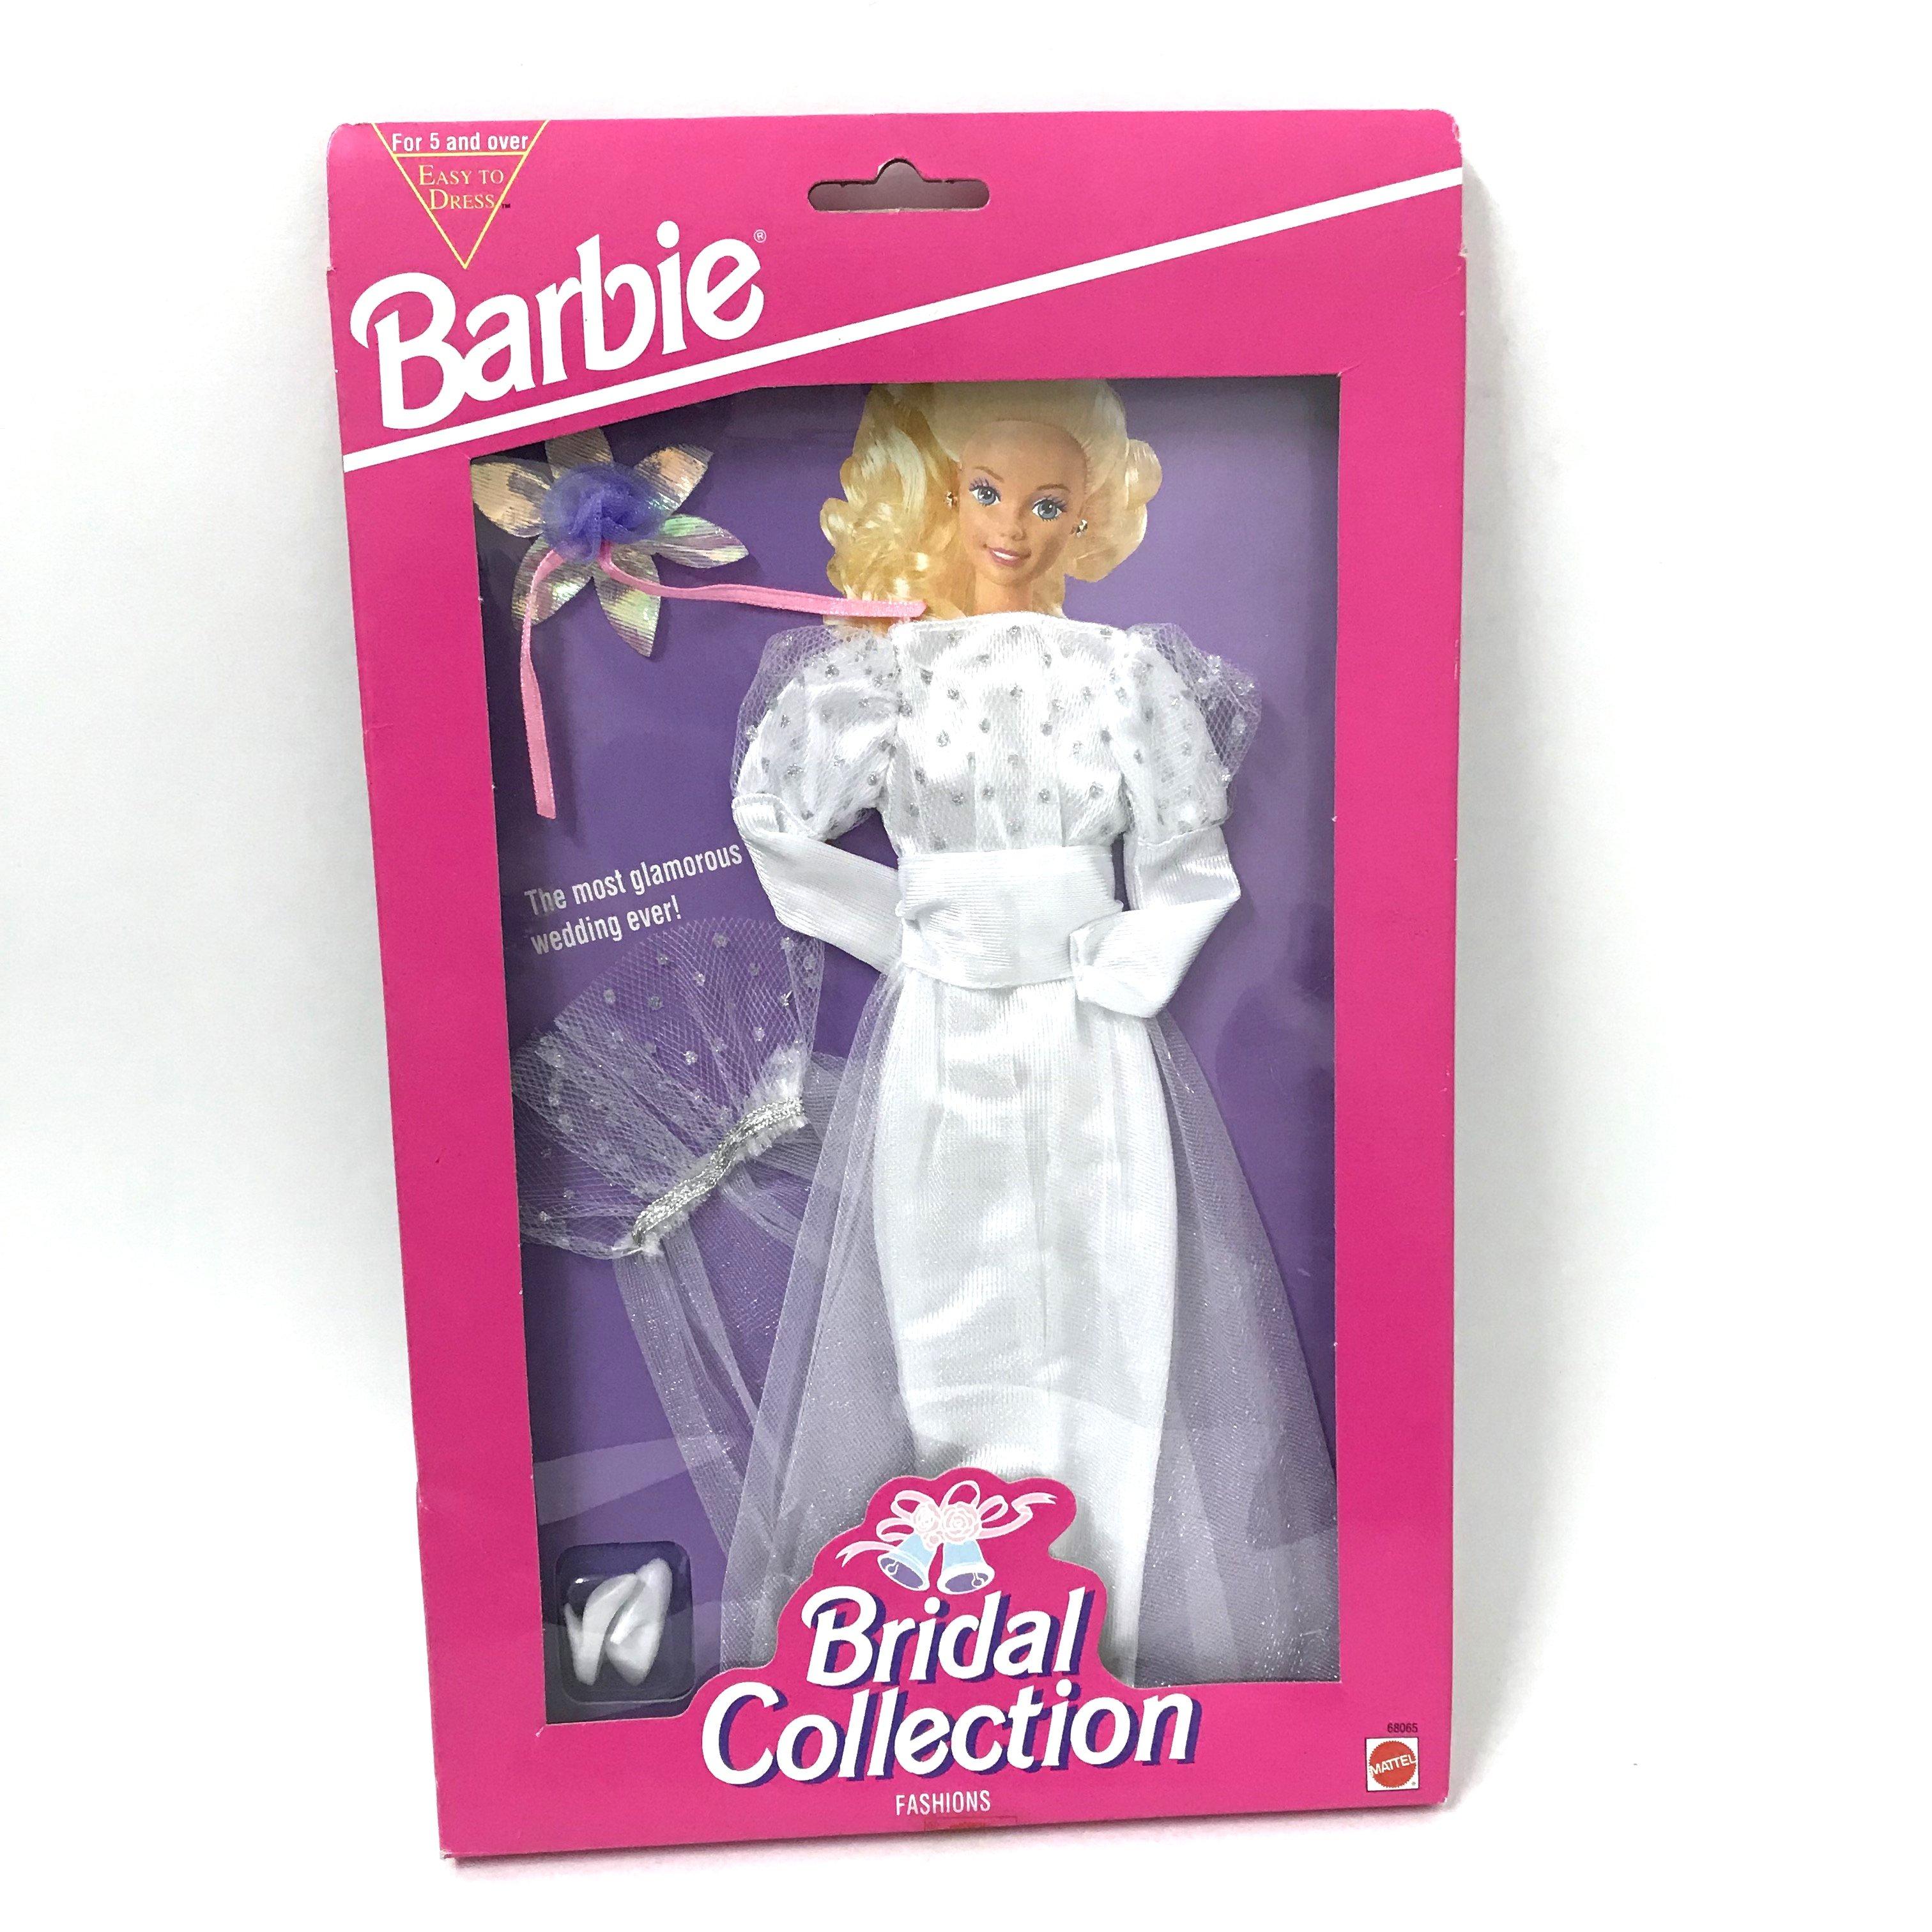 MATTEL BARBIE FASHION BRIDAL COLLECTION 68065 NIB NRFB 1993